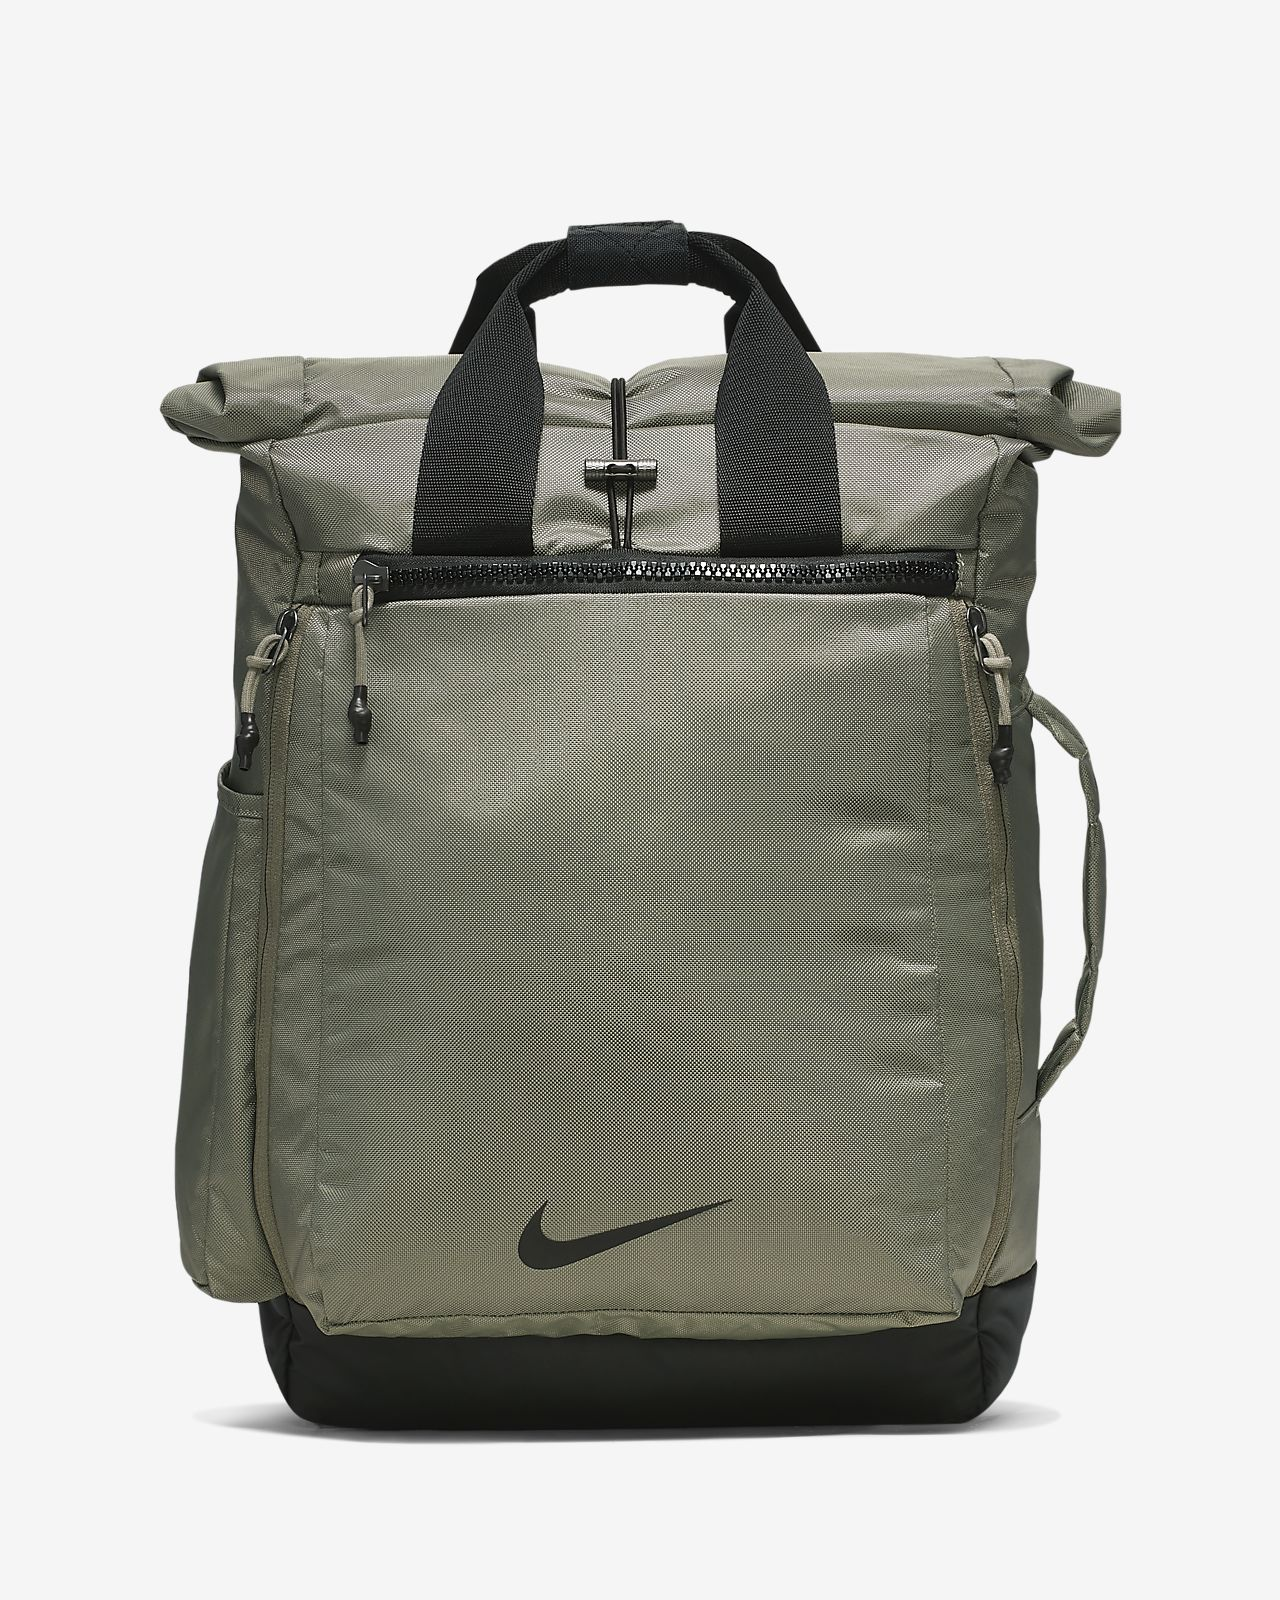 Plecak treningowy Nike Vapor Energy 2.0